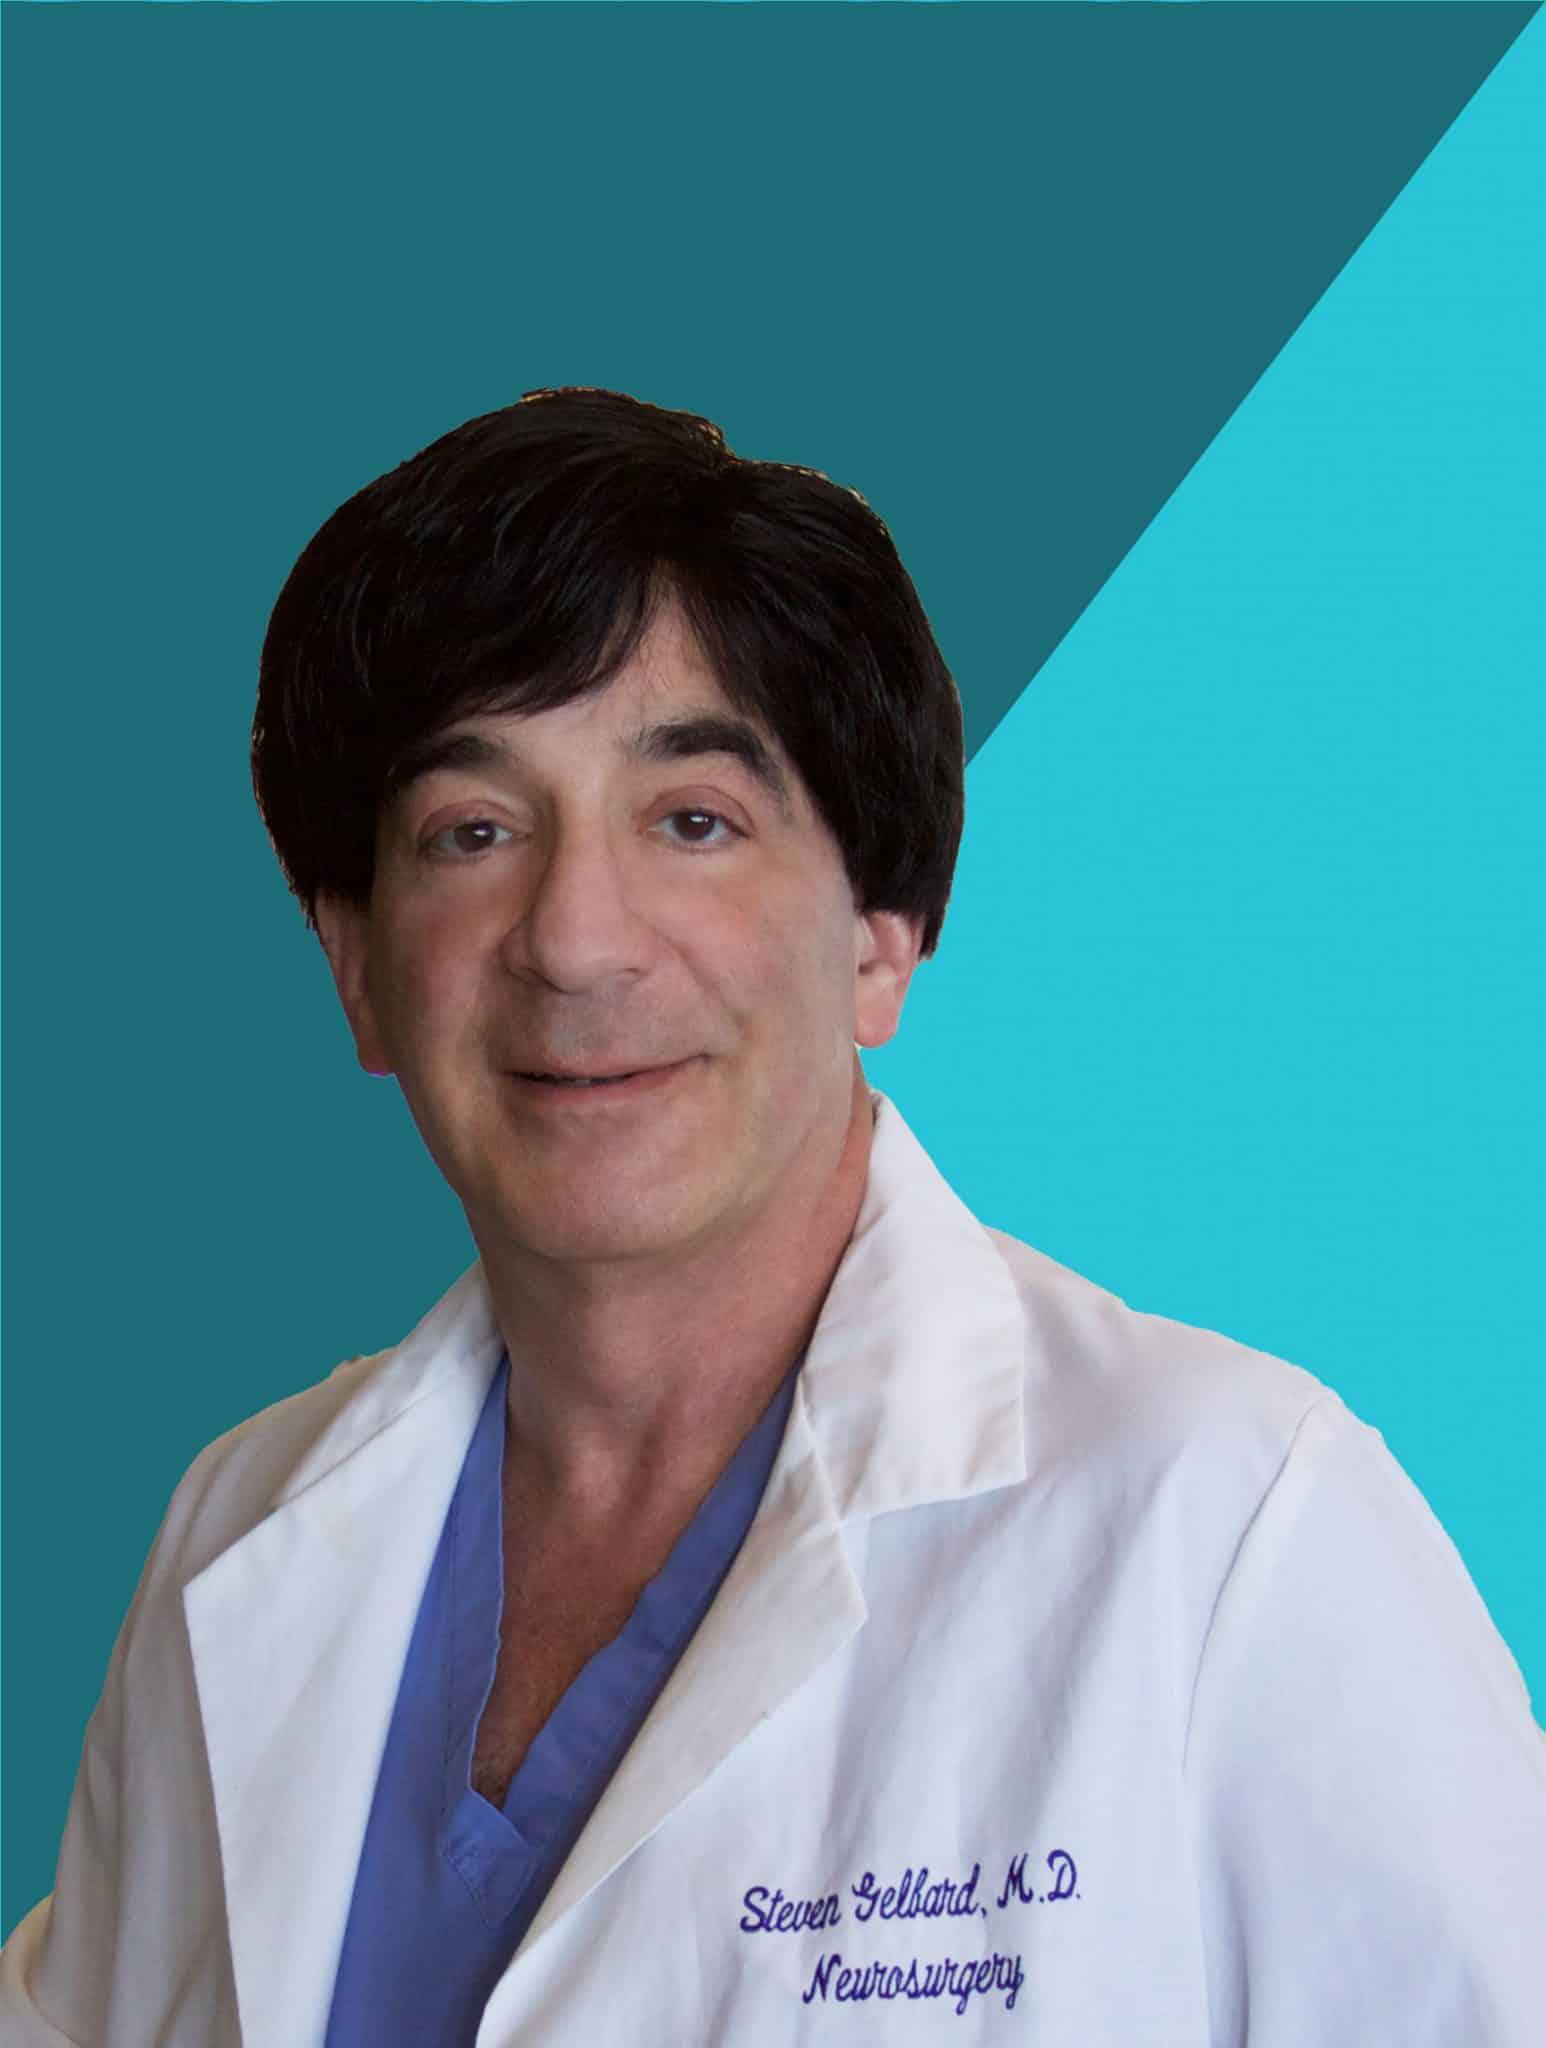 Dr. Steven Gelbard